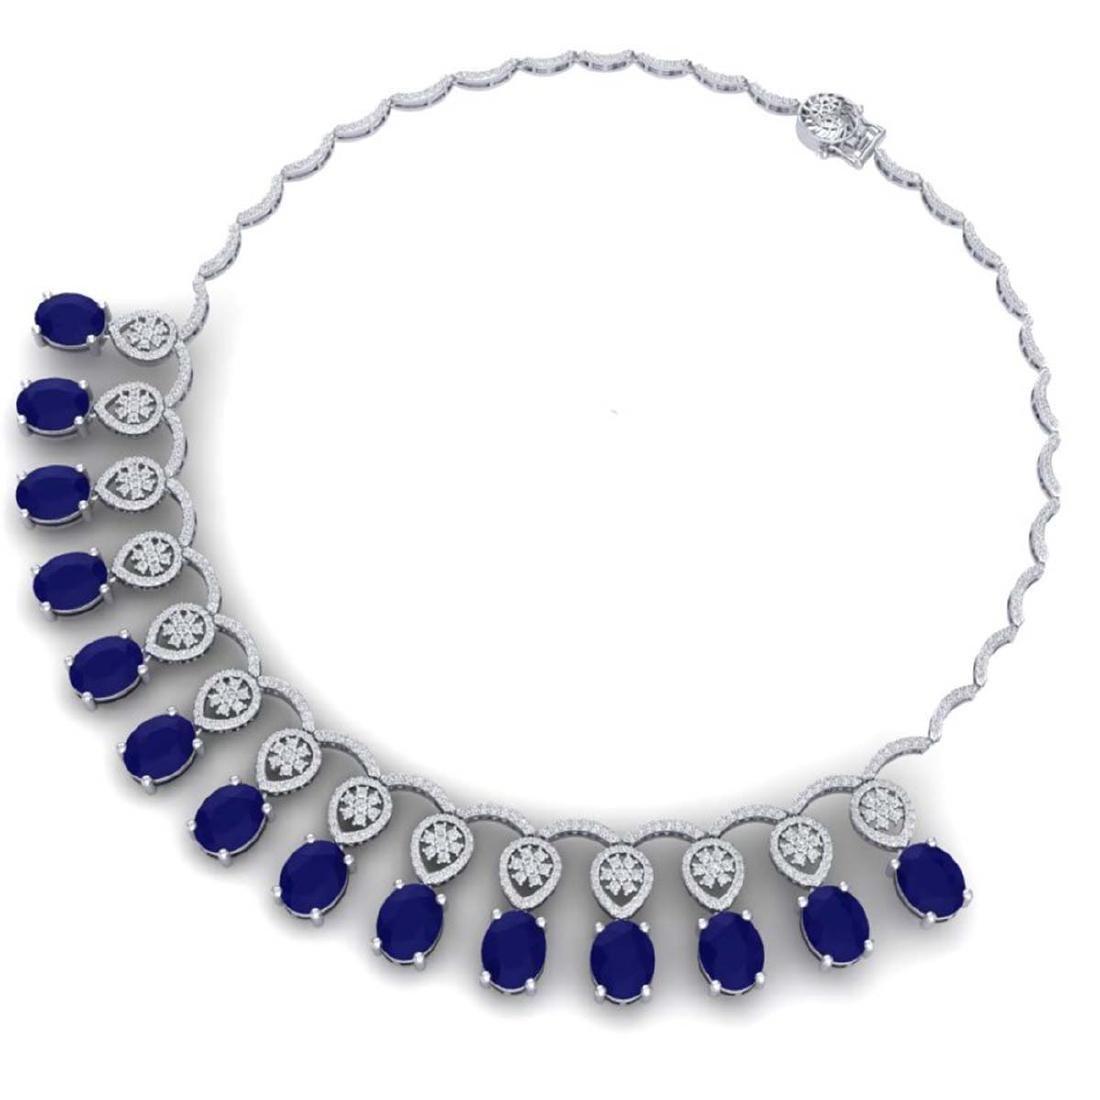 54.05 ctw Sapphire & VS Diamond Necklace 18K White Gold - 3